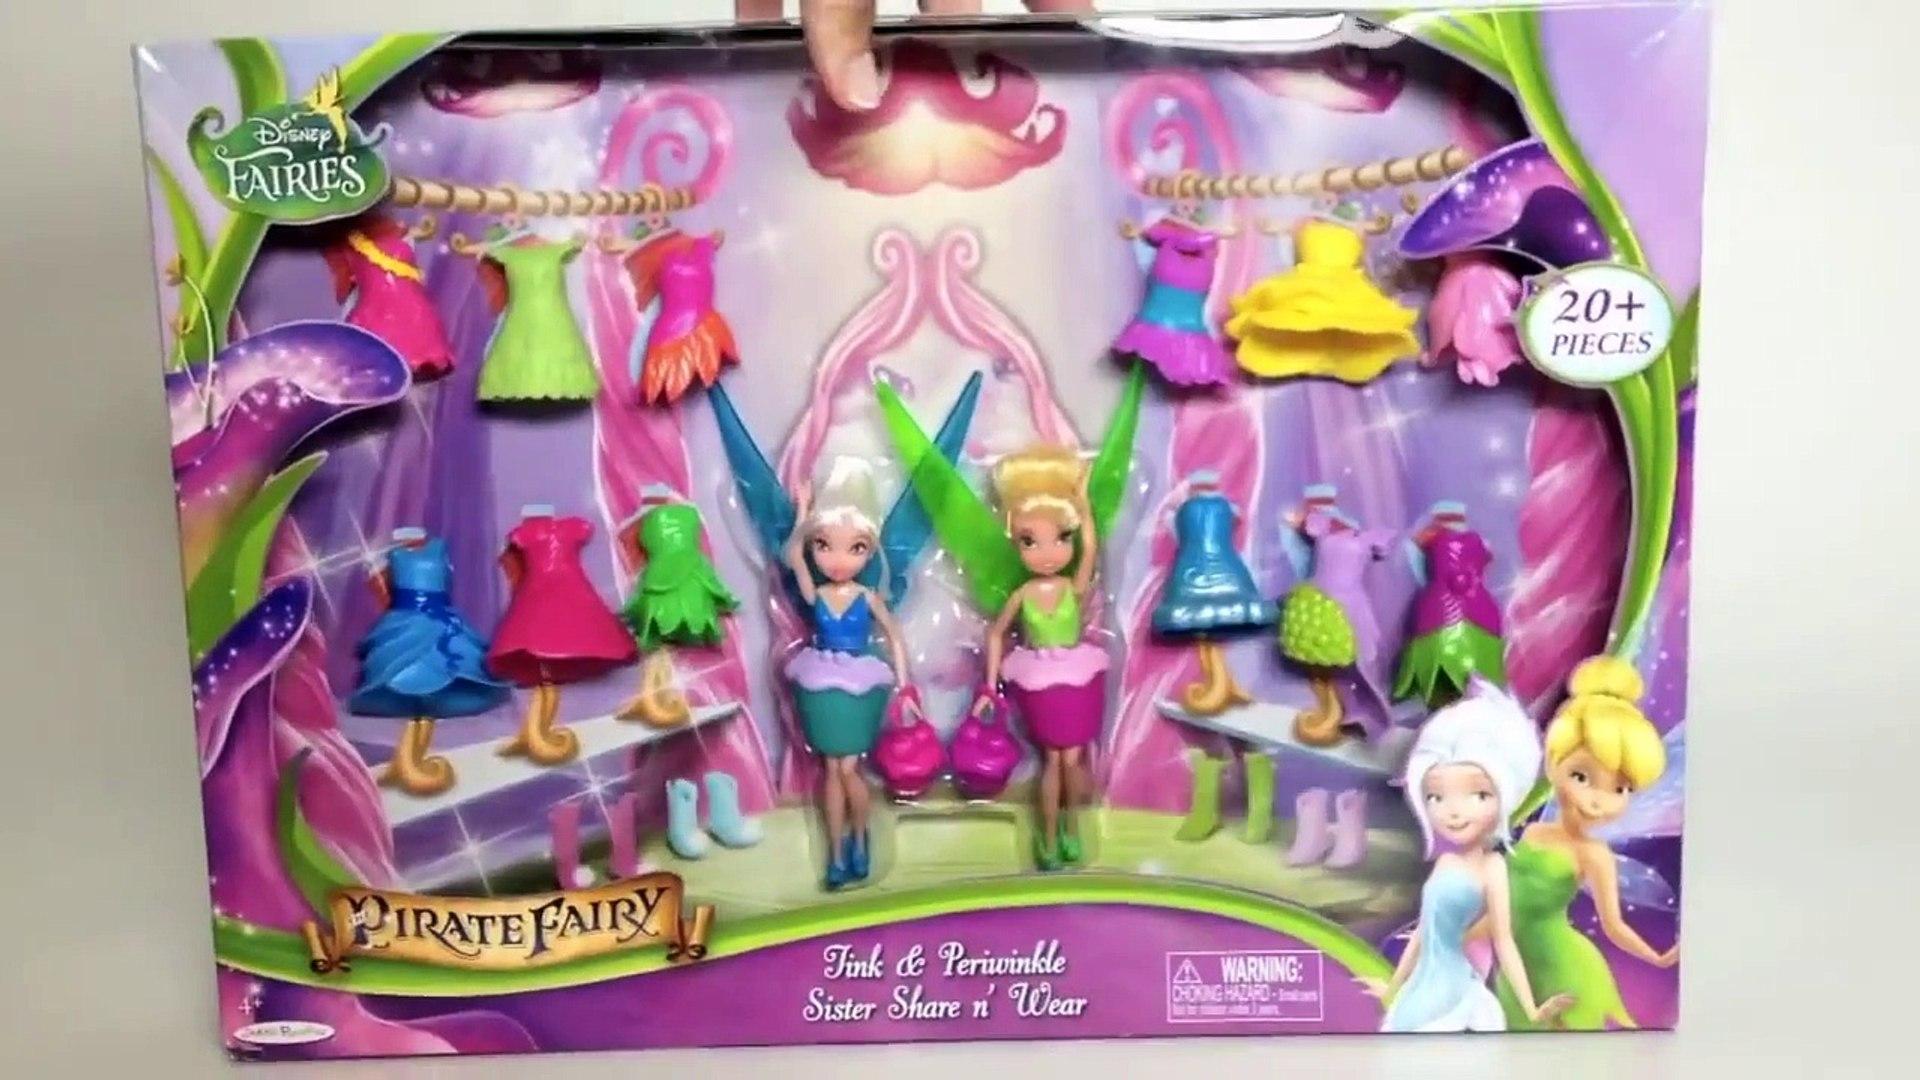 Disney Fairies Tink & Periwinkle Sister Share n Wear Disney Pirate Fairy Movie Fairies Dr